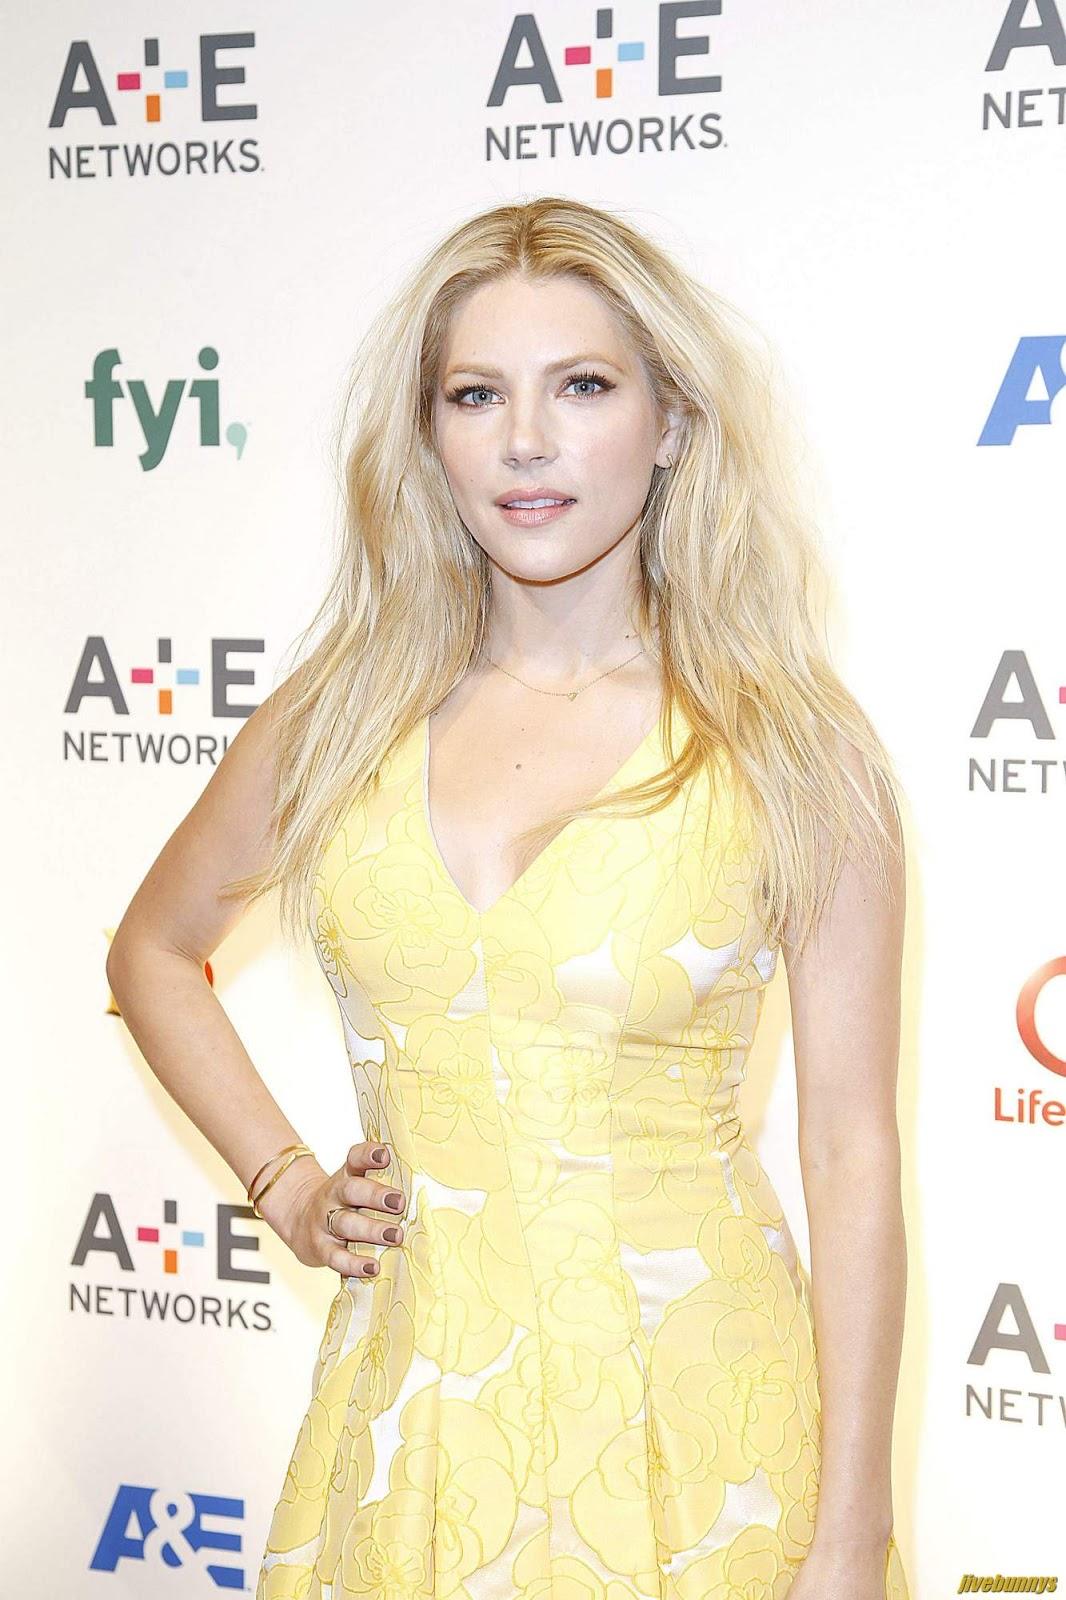 Jivebunnys Female Celebrity Picture Gallery: Katheryn ...